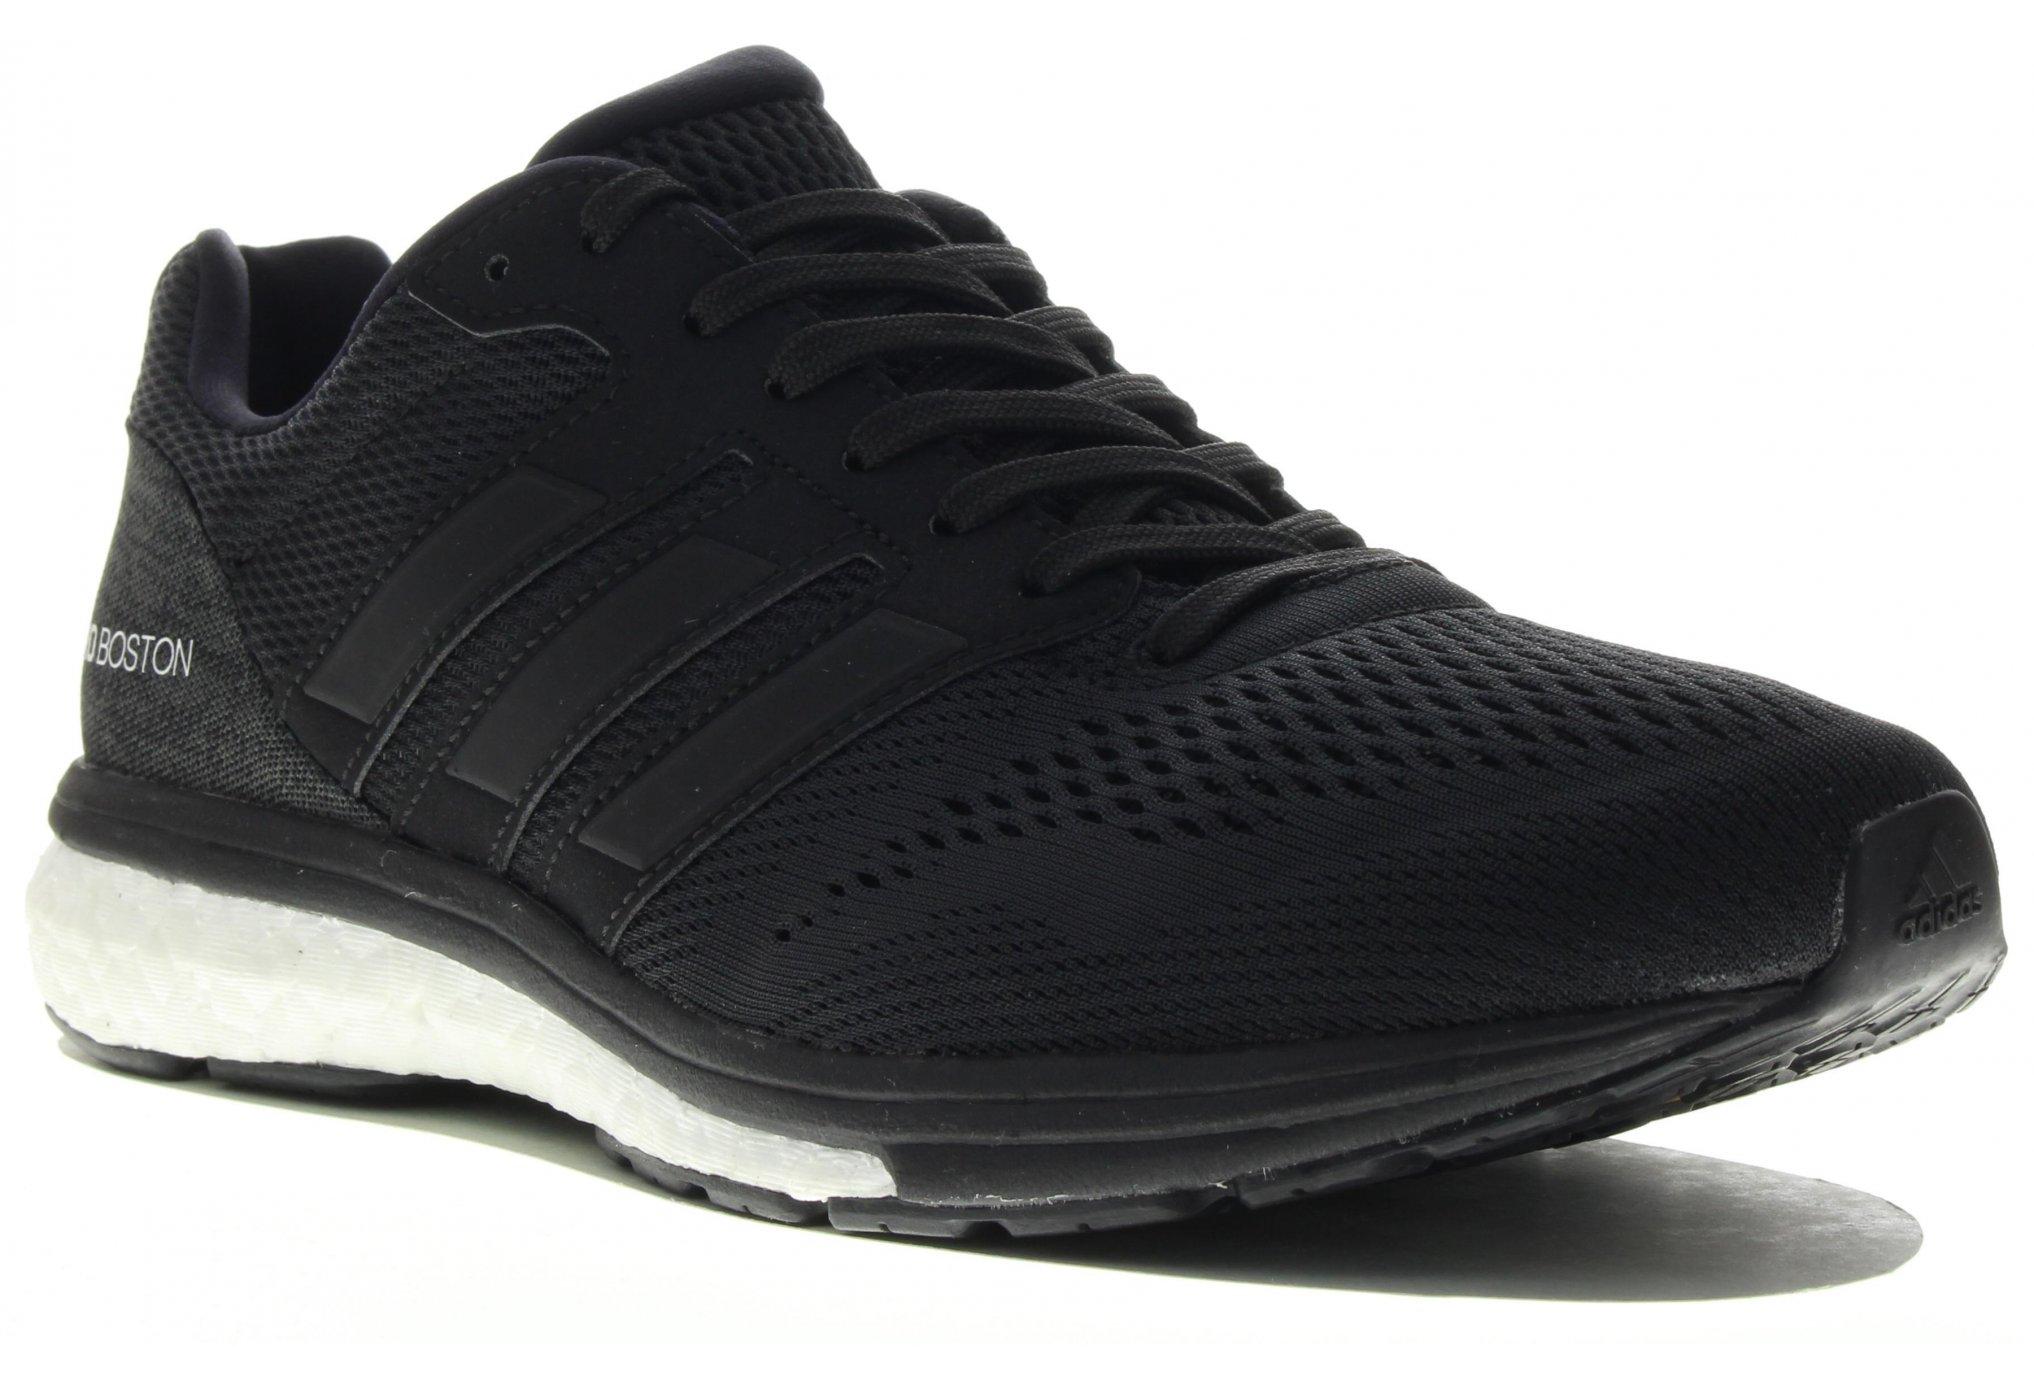 adidas adizero Boston 7 Chaussures running femme